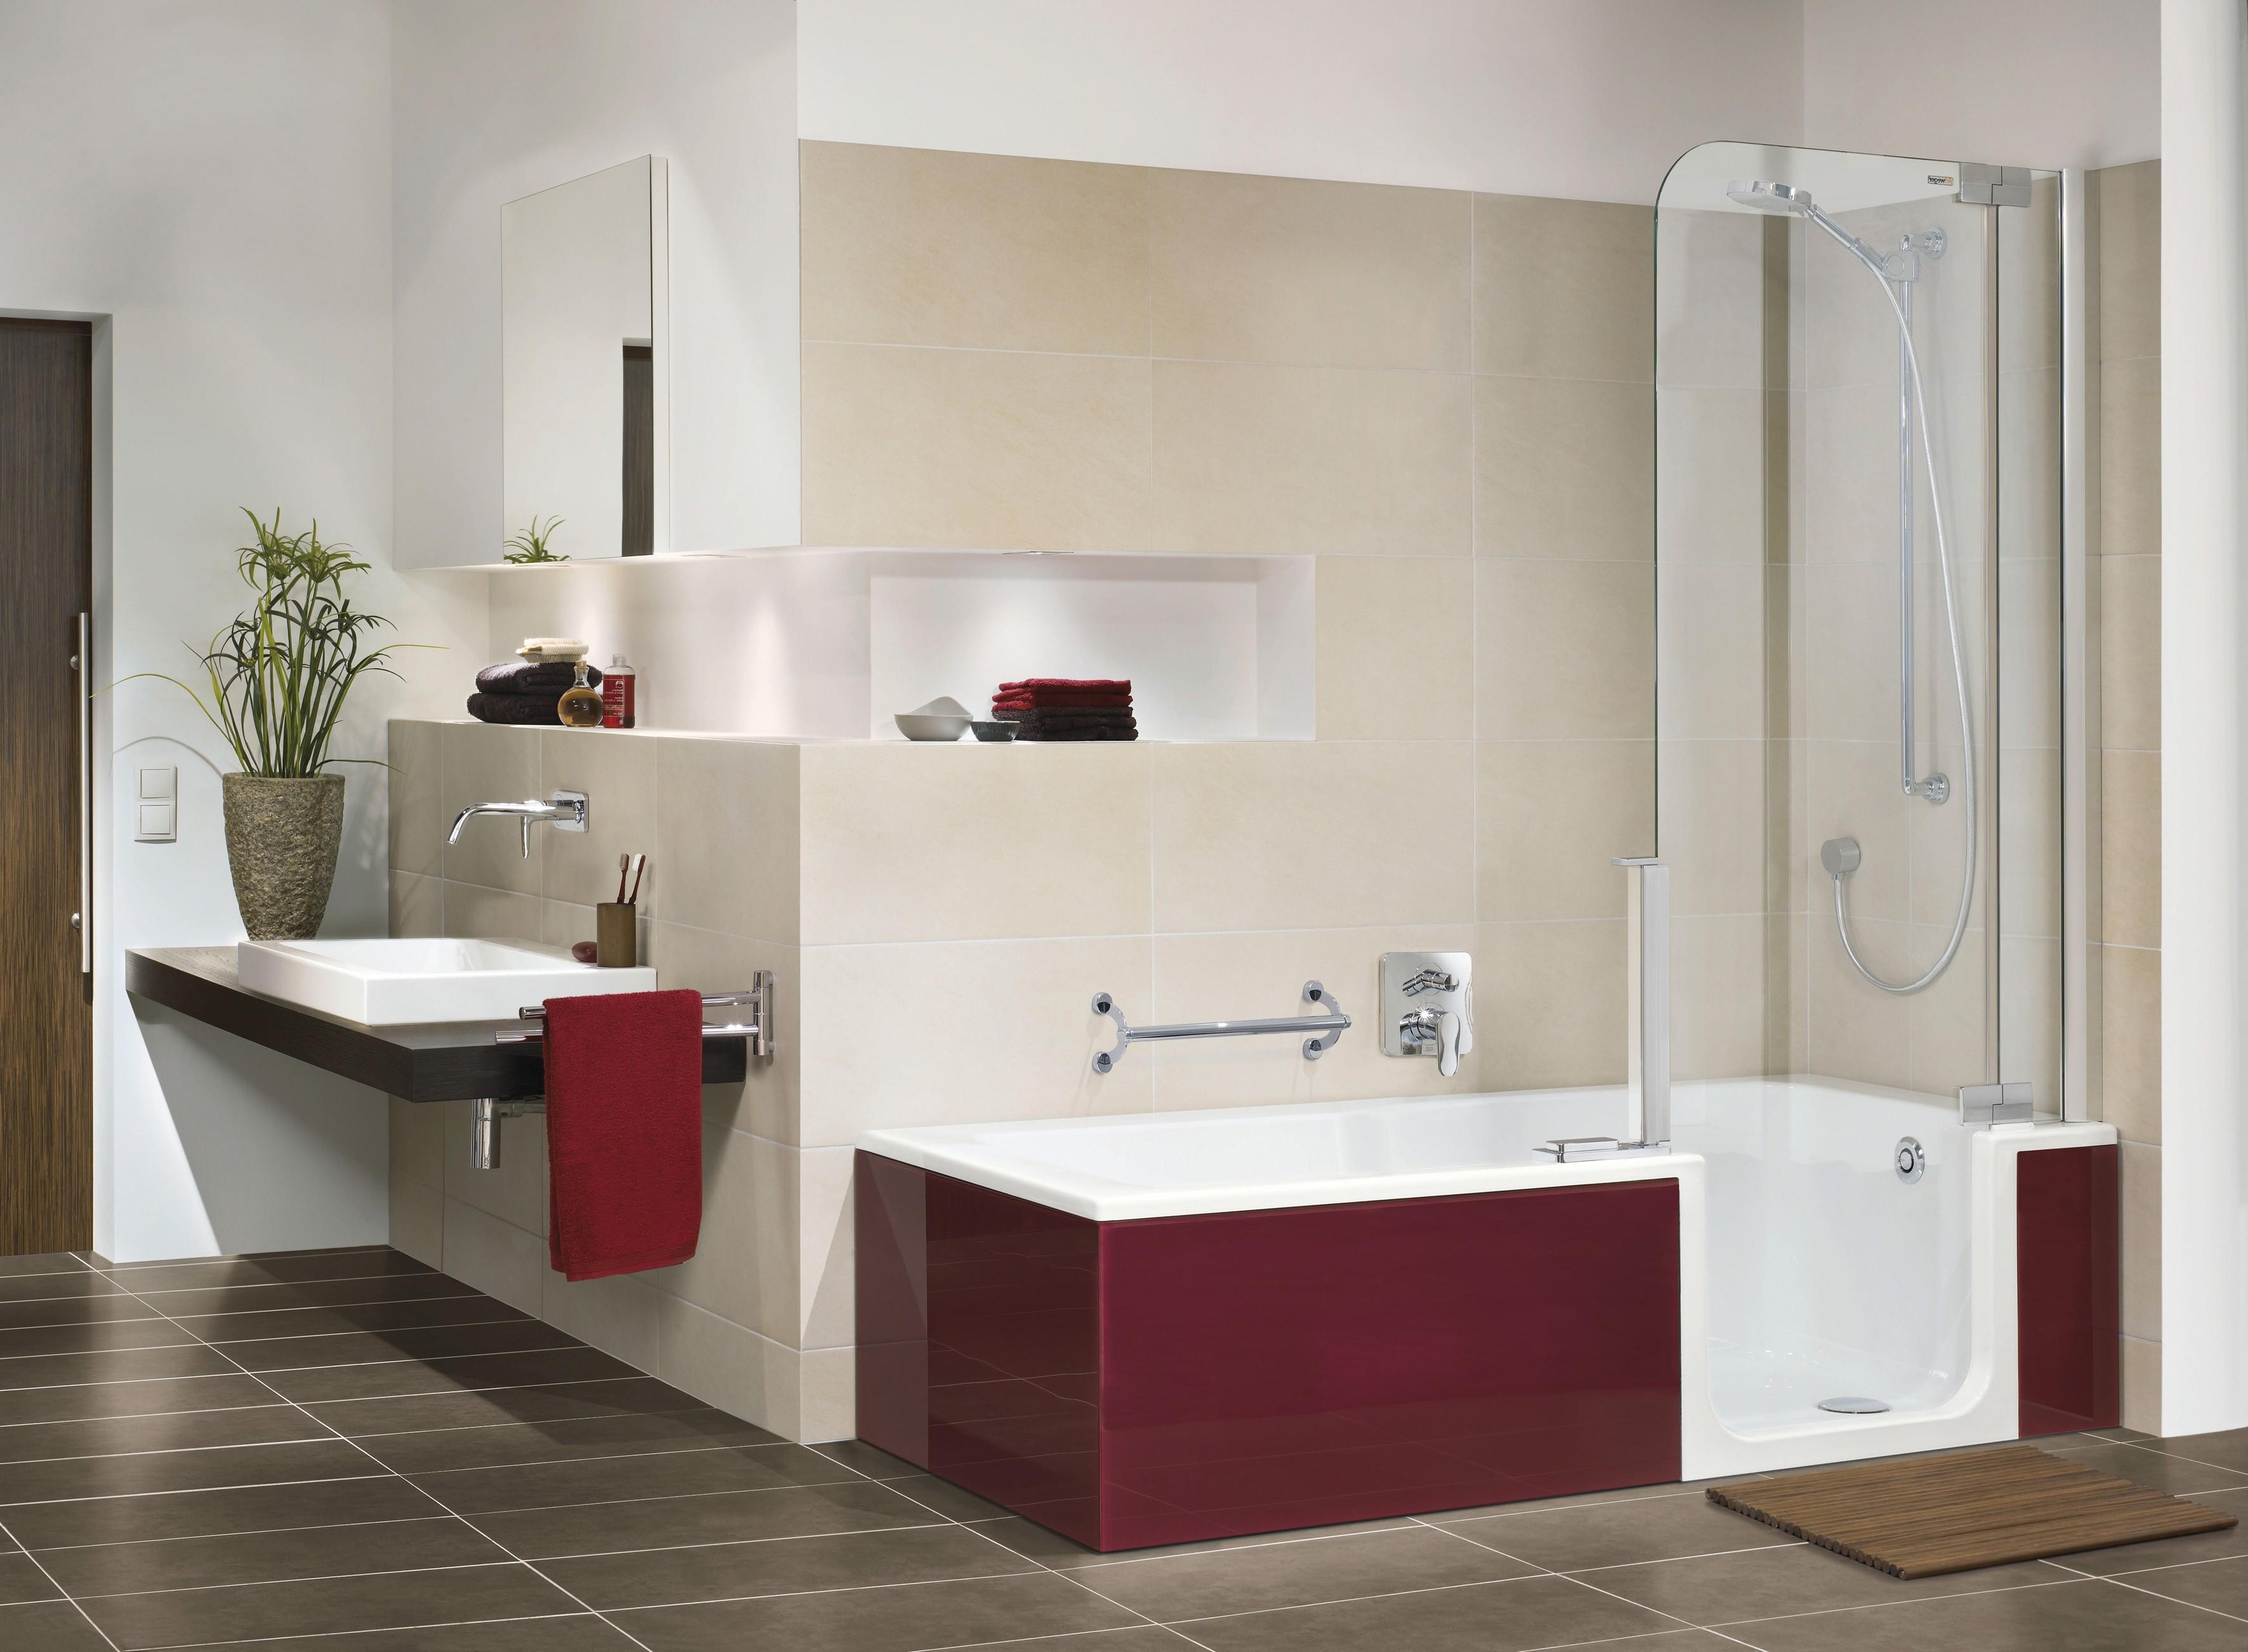 Bathroom Tub Shower HomesFeed - Modern bathroom tub shower combo